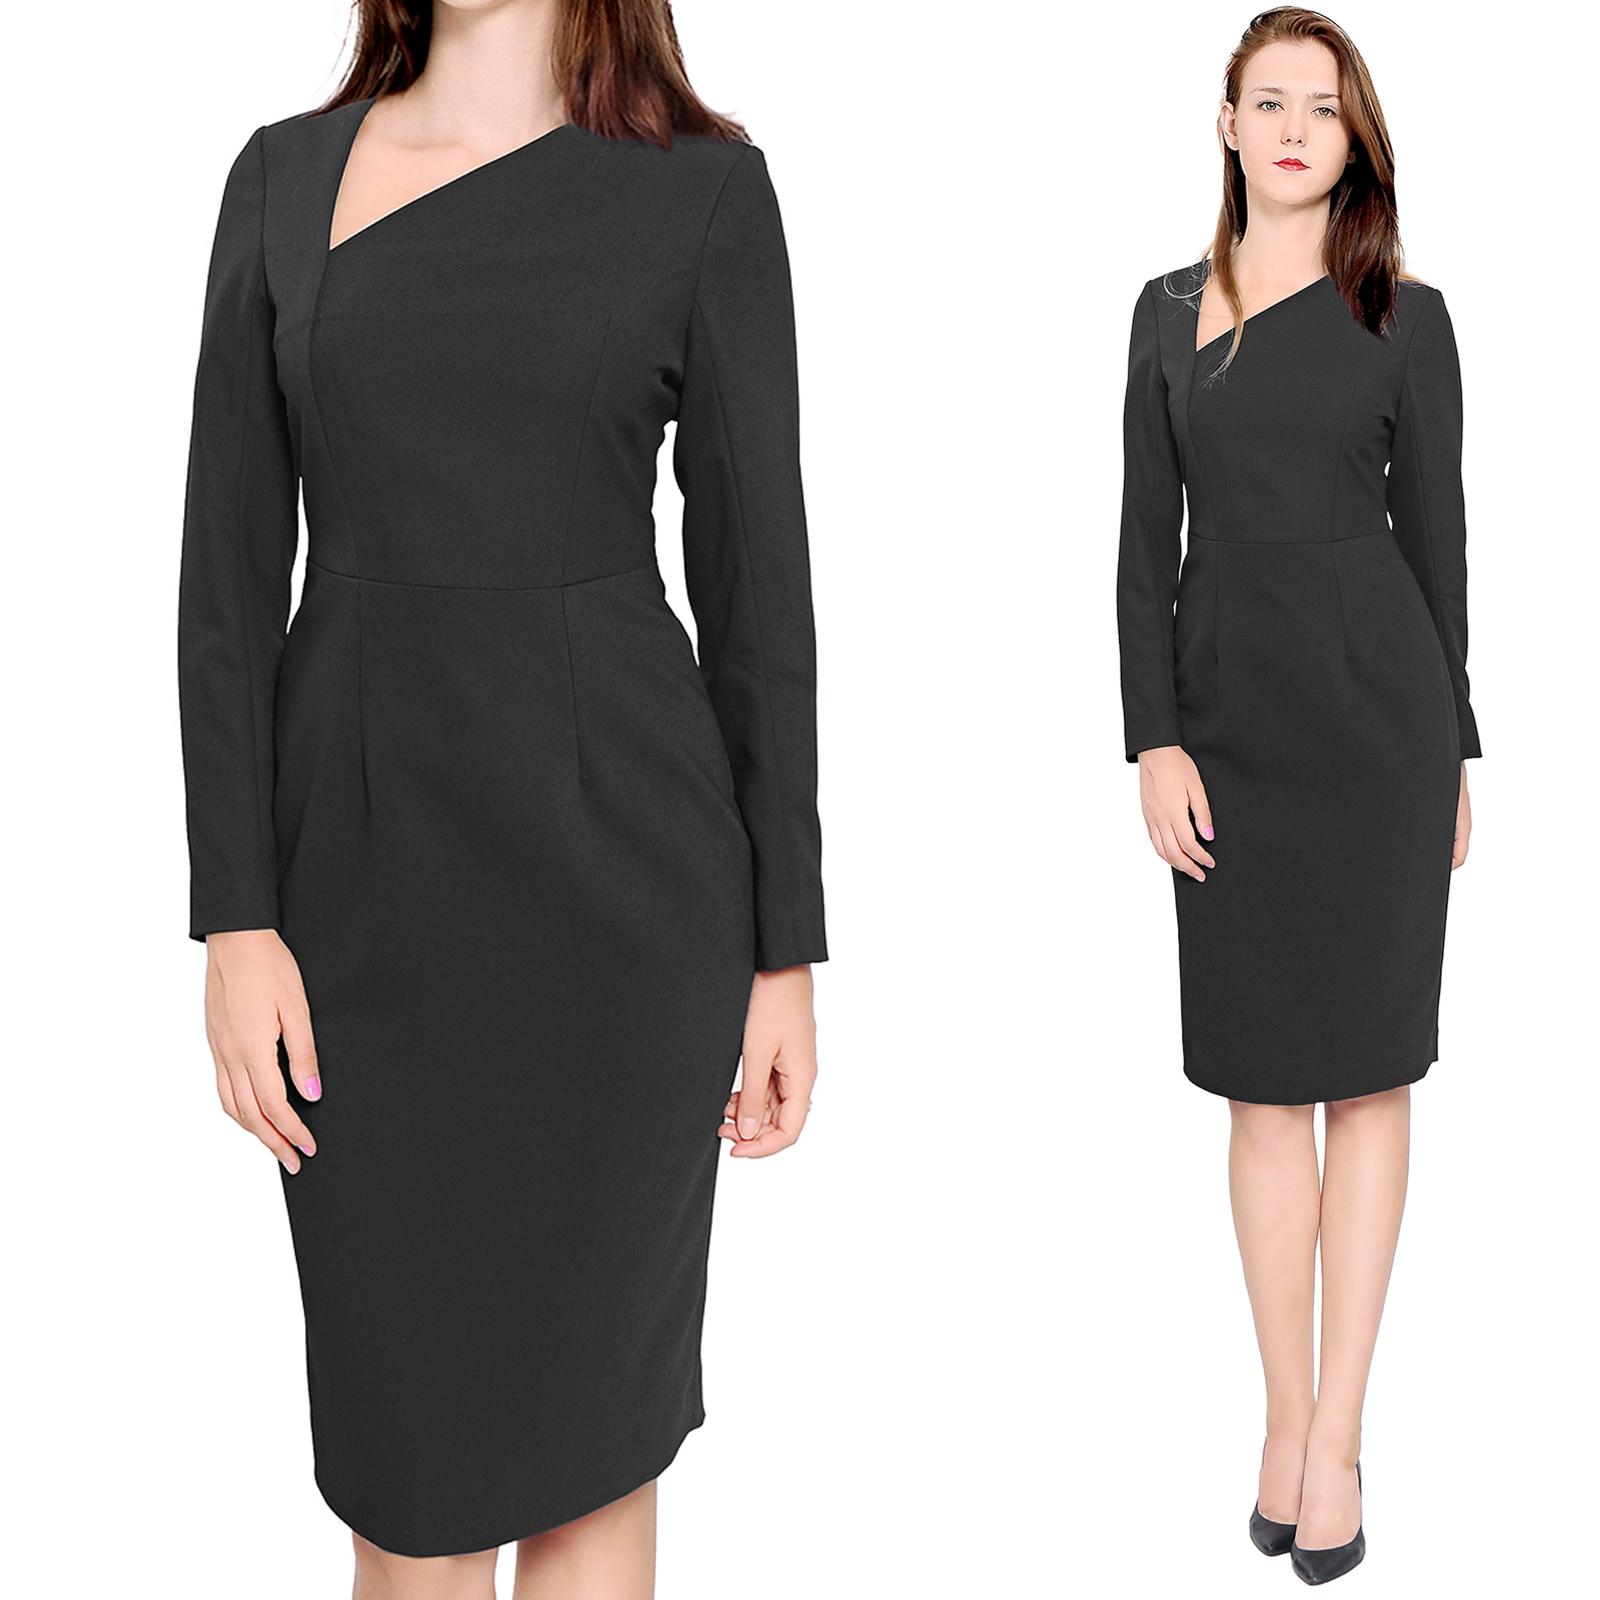 Black dress office - Elegant Sheath Midi Dress Asymmetrical Neckline Pencil Dresses